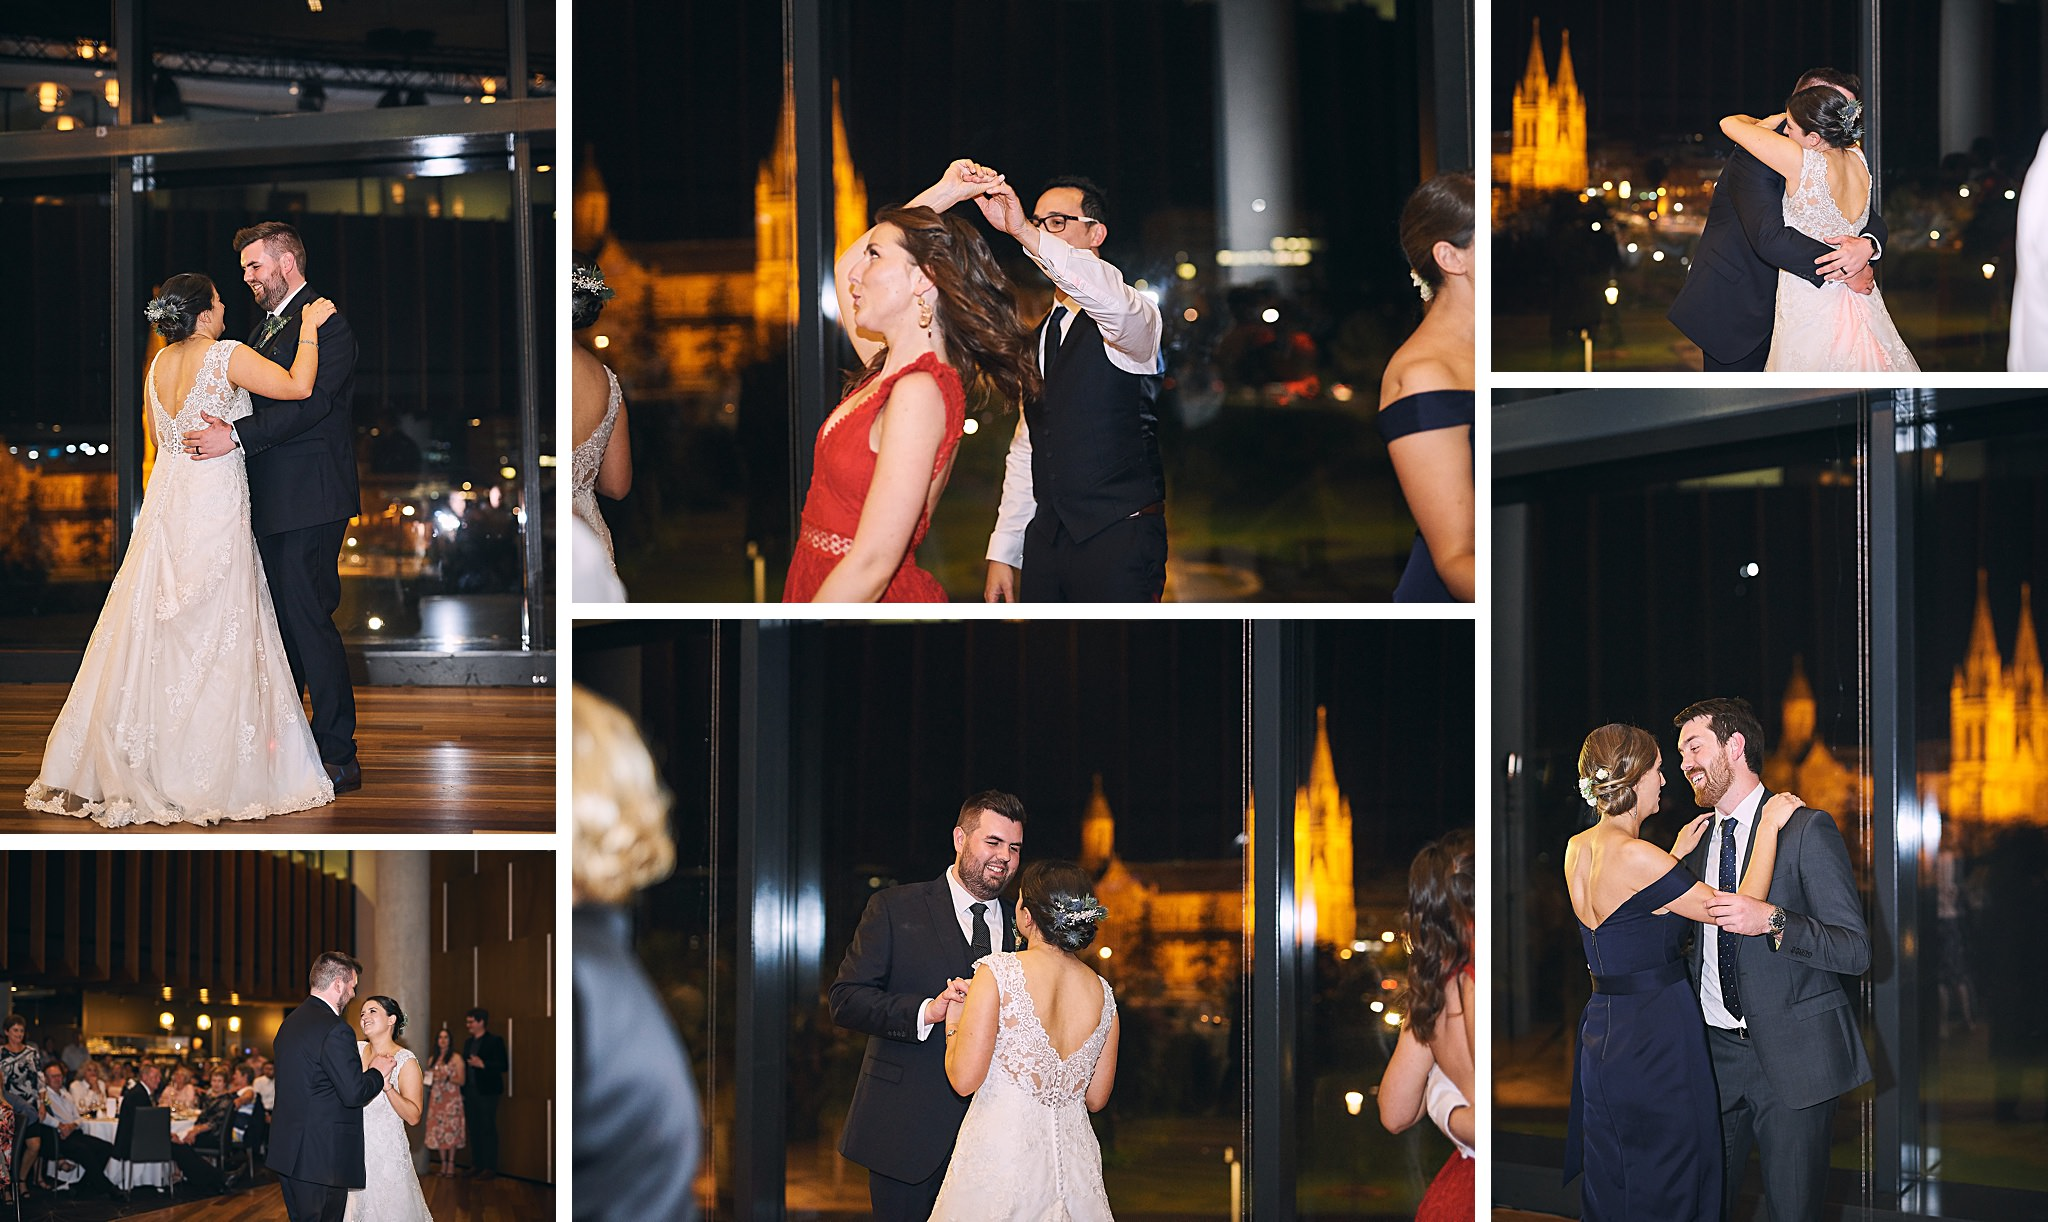 Adelaide_oval_wedding_0010.jpg